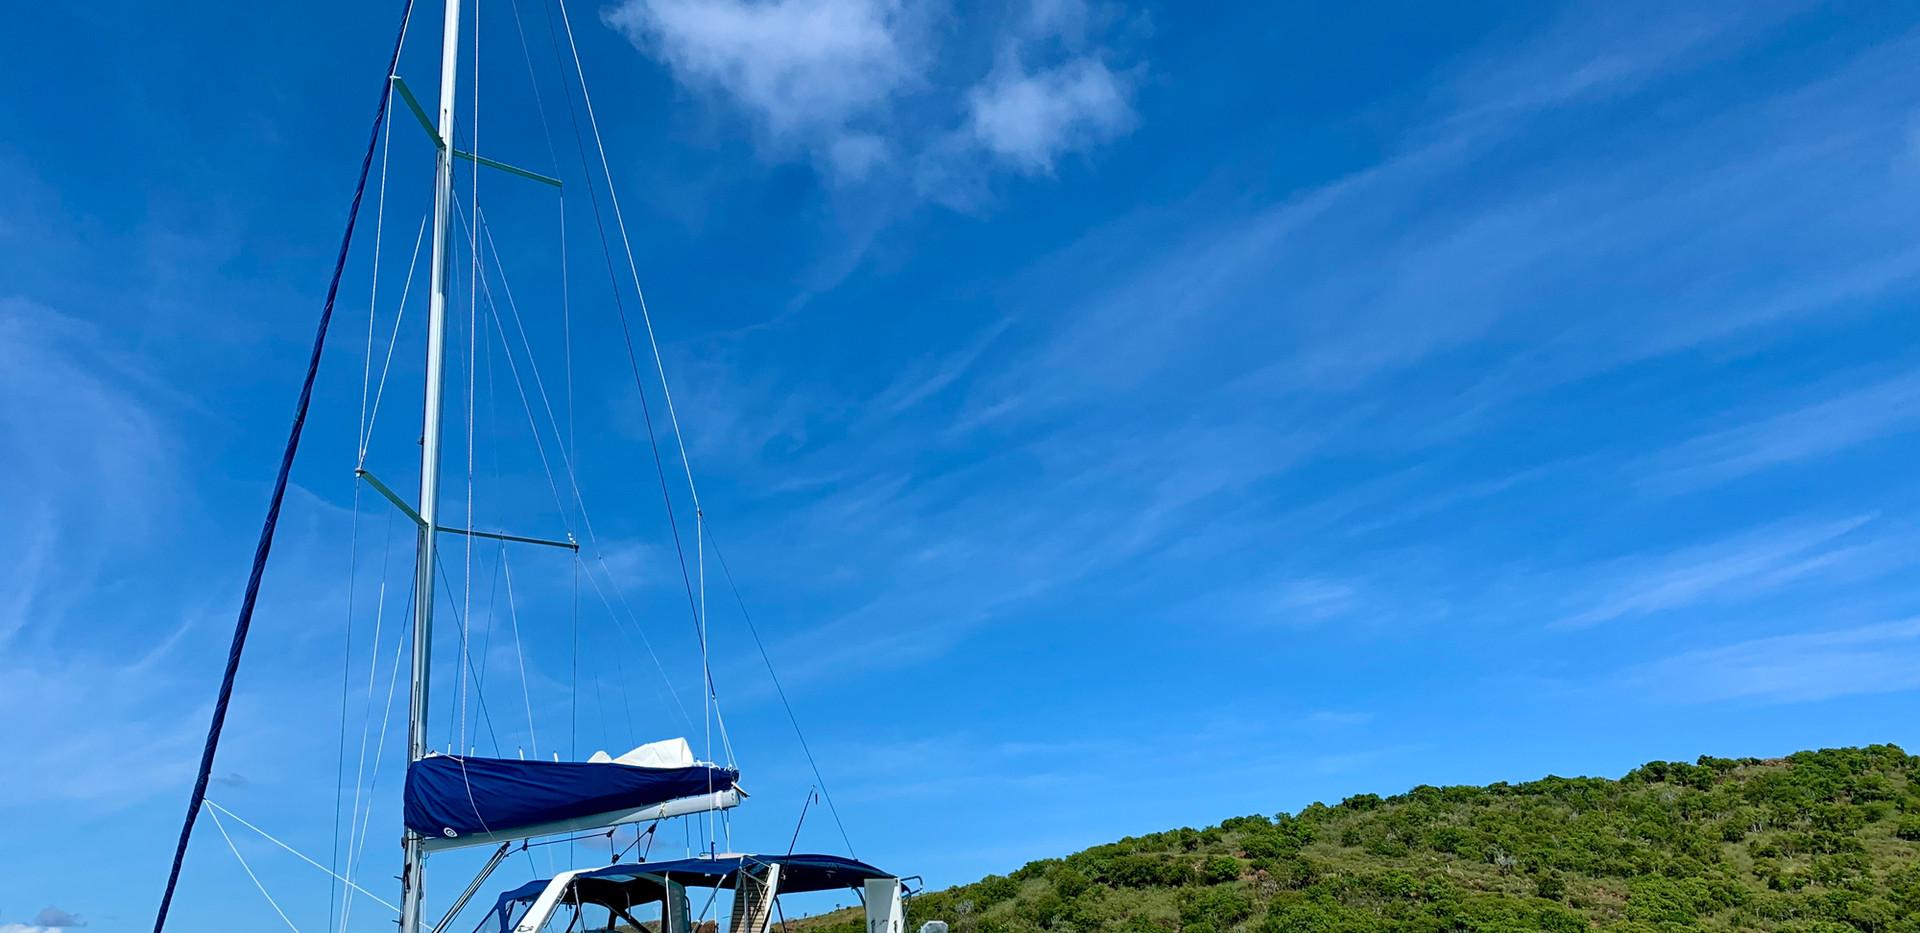 Private Saling Adventures Puerto R